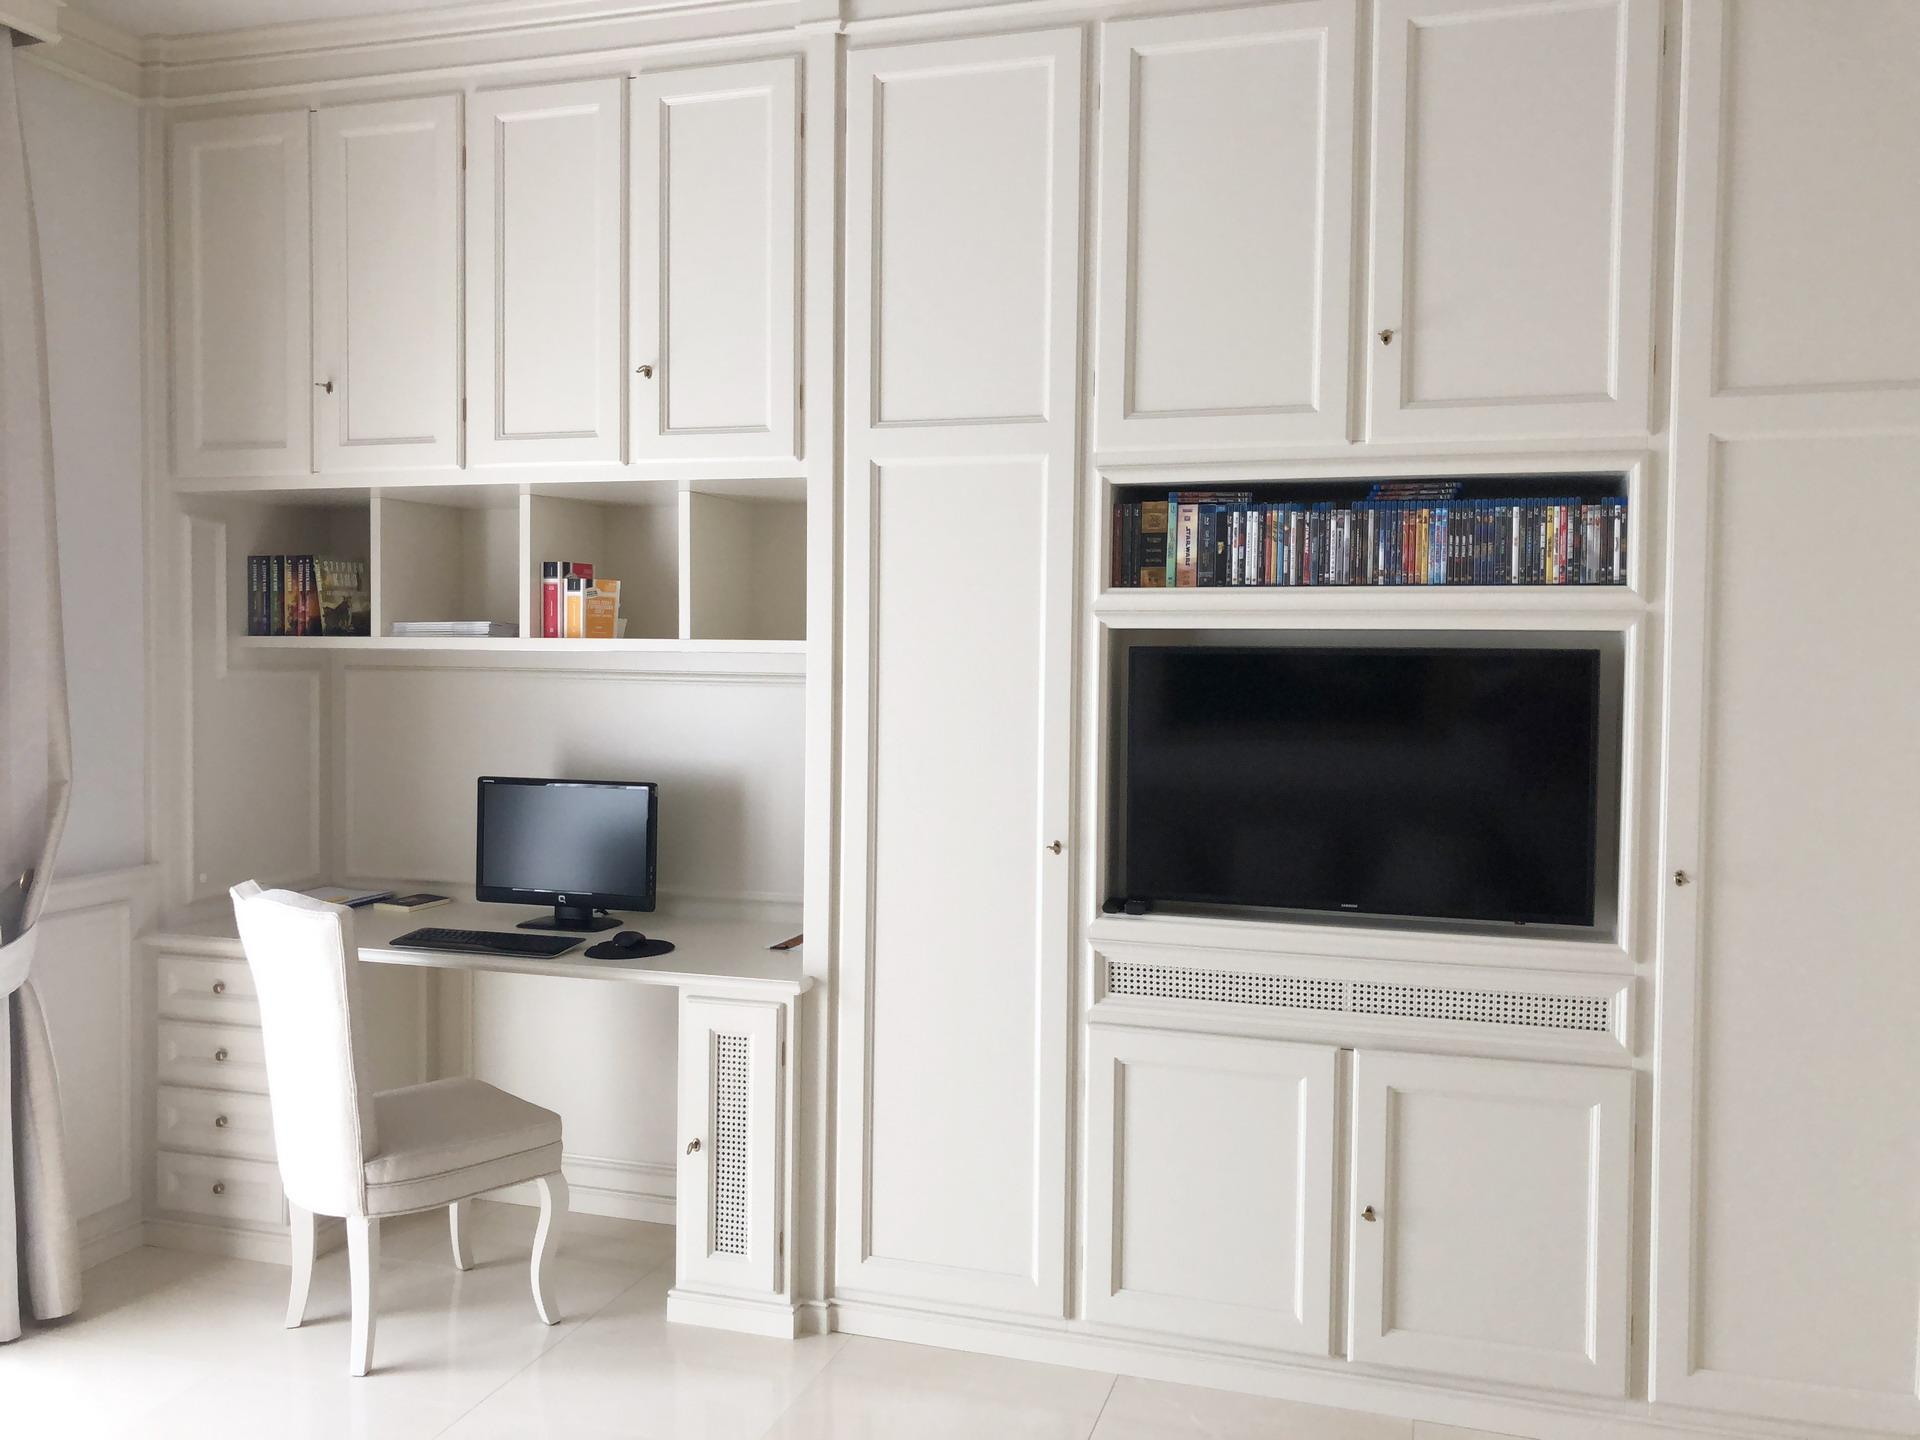 studio-camera-appartamento-genova-2